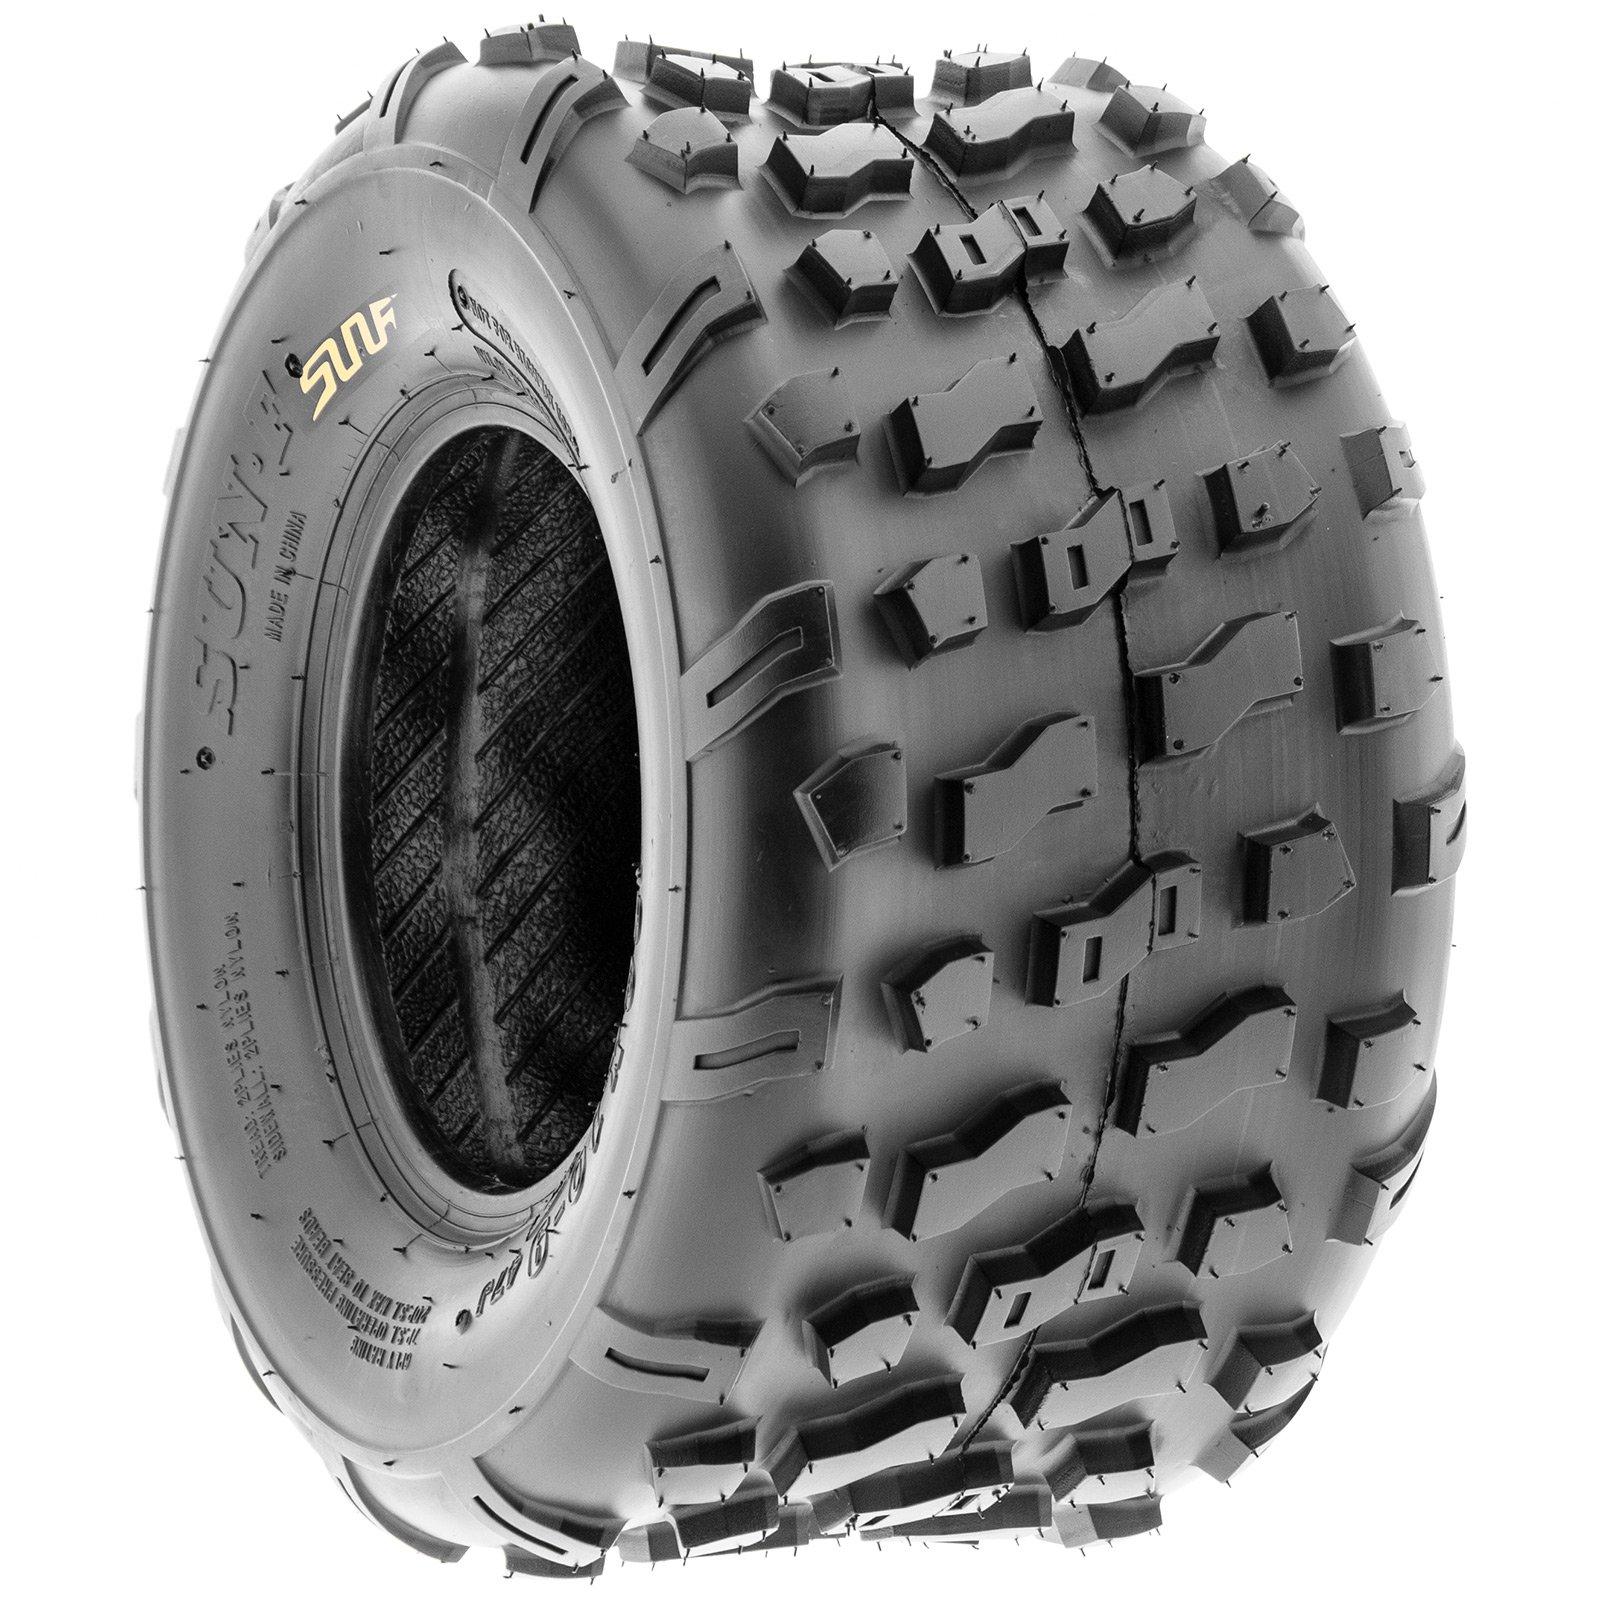 SunF Rear ATV Knobby Tires 20x10-9 20x10x9 4 PR A022 (Set pair of 2) by SunF (Image #6)